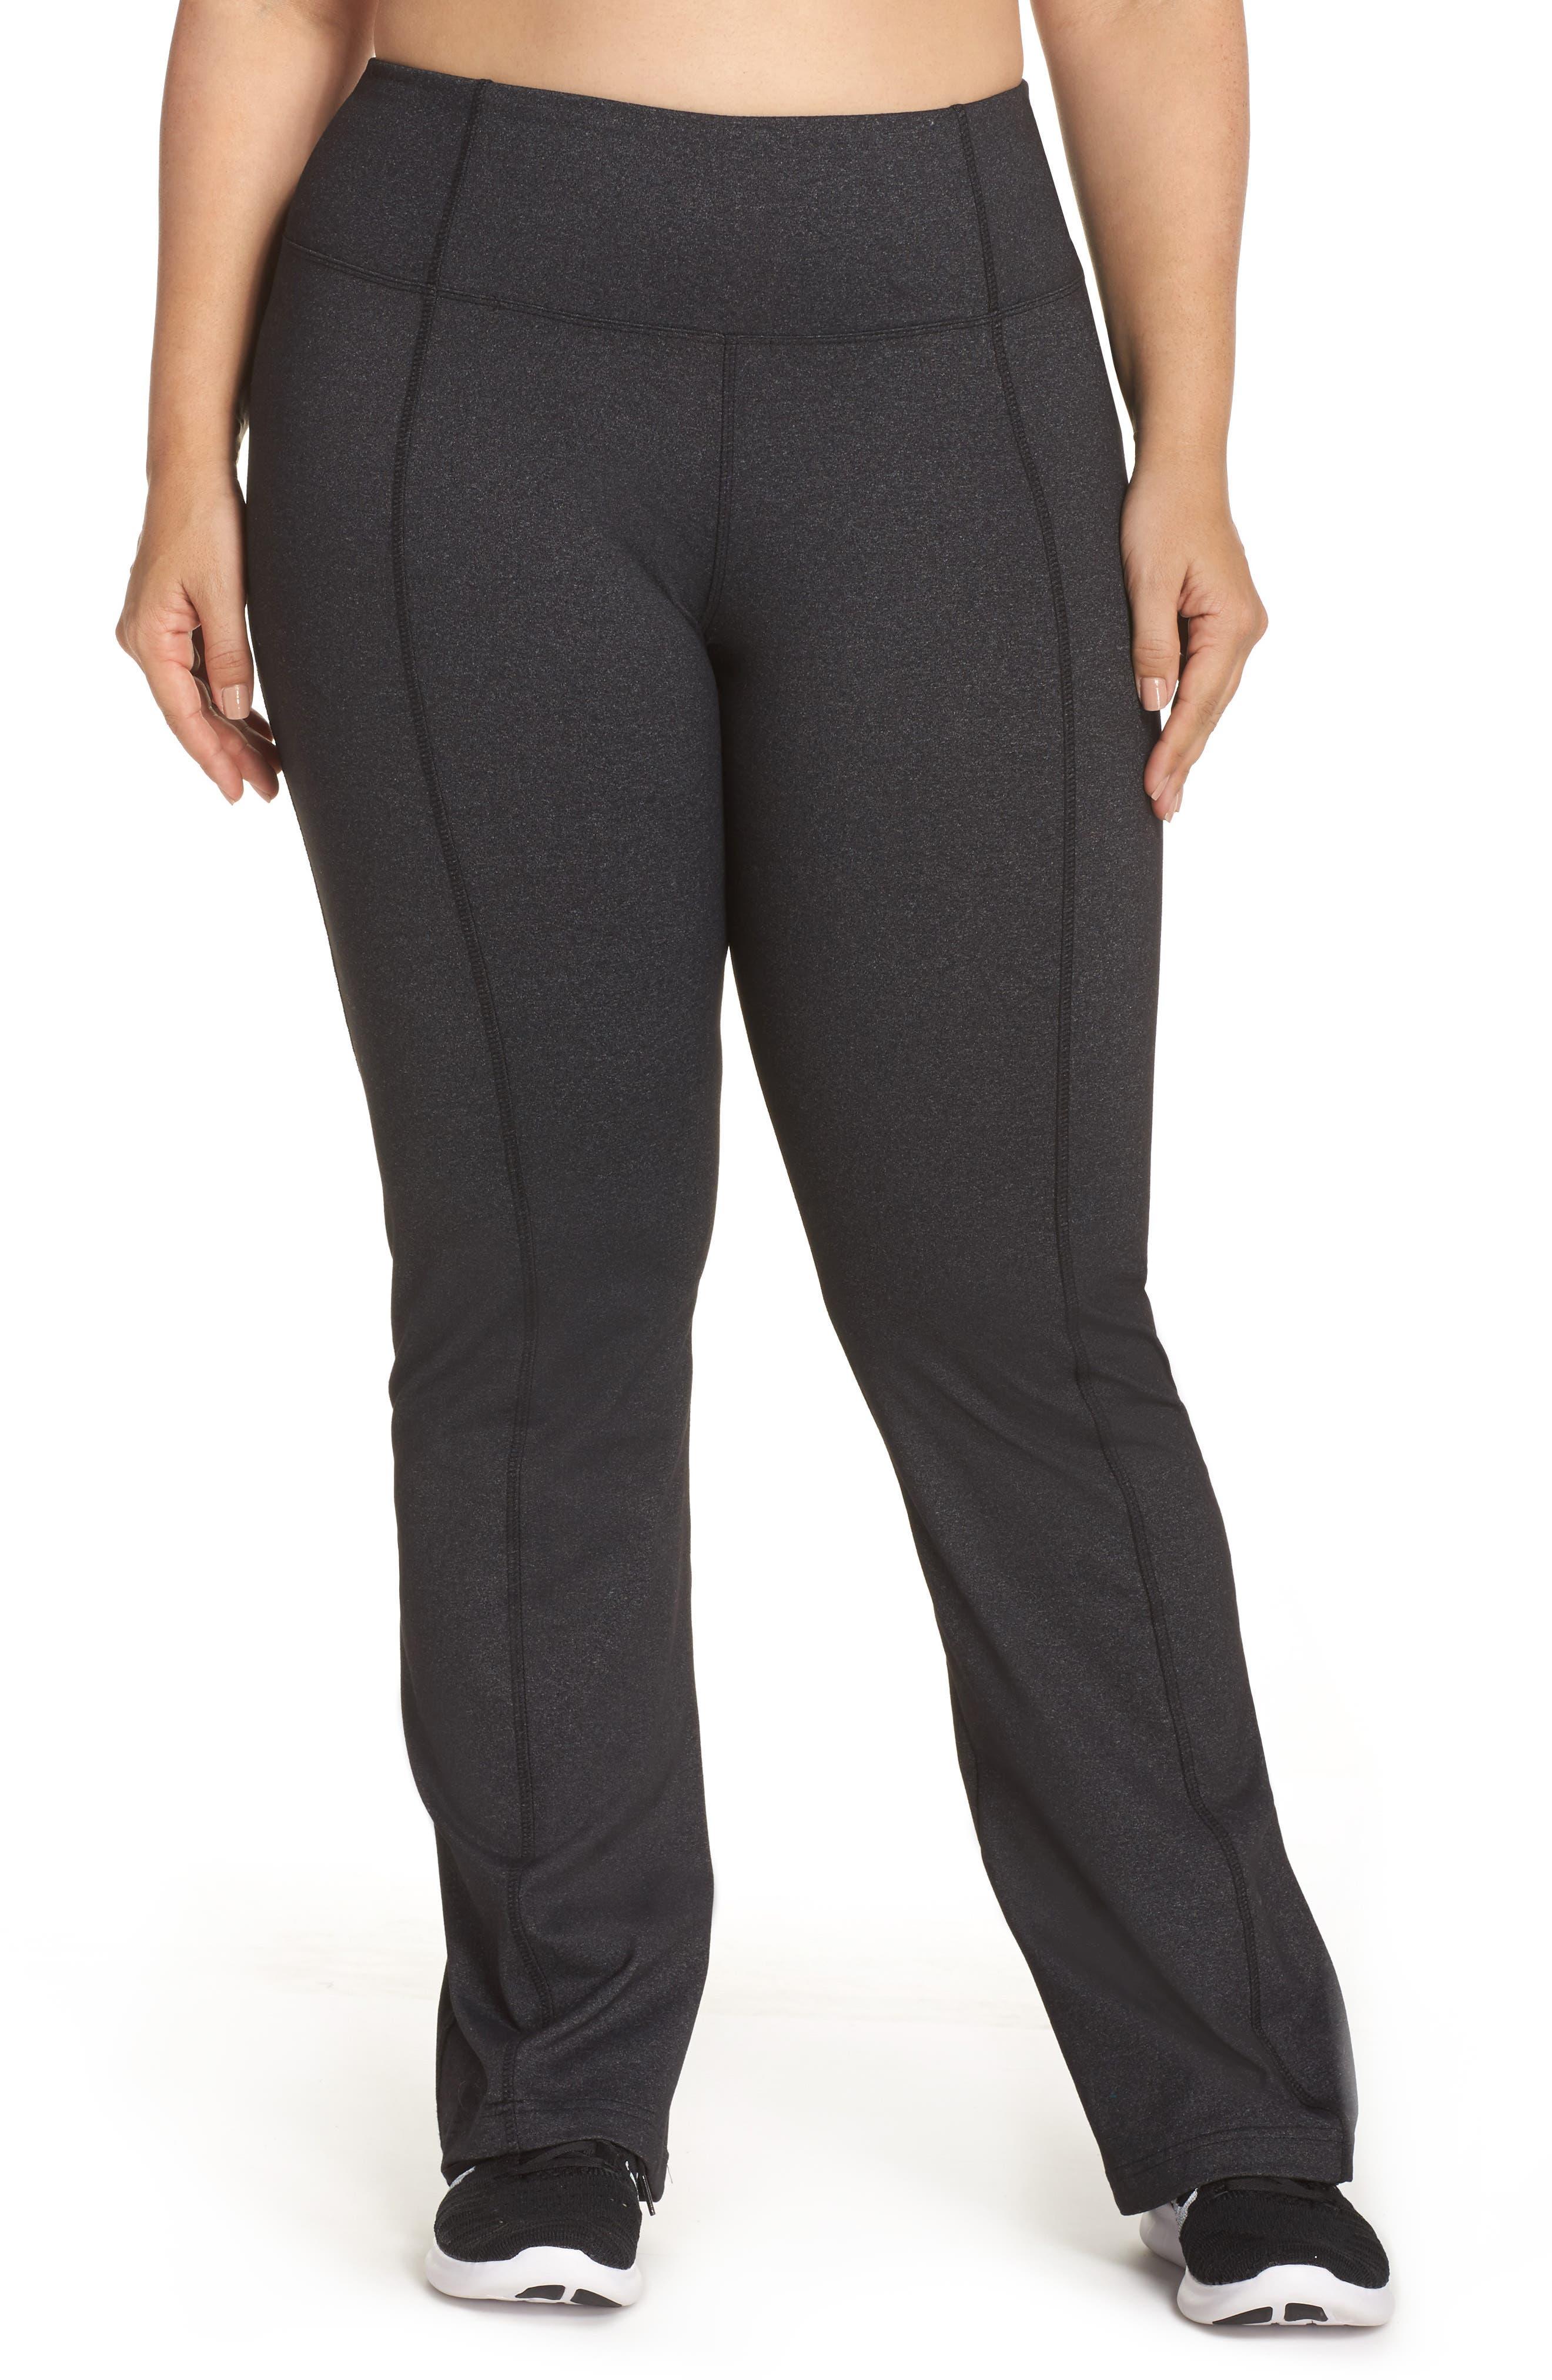 Main Image - Marika Curves High Rise Control Top Bootcut Pants